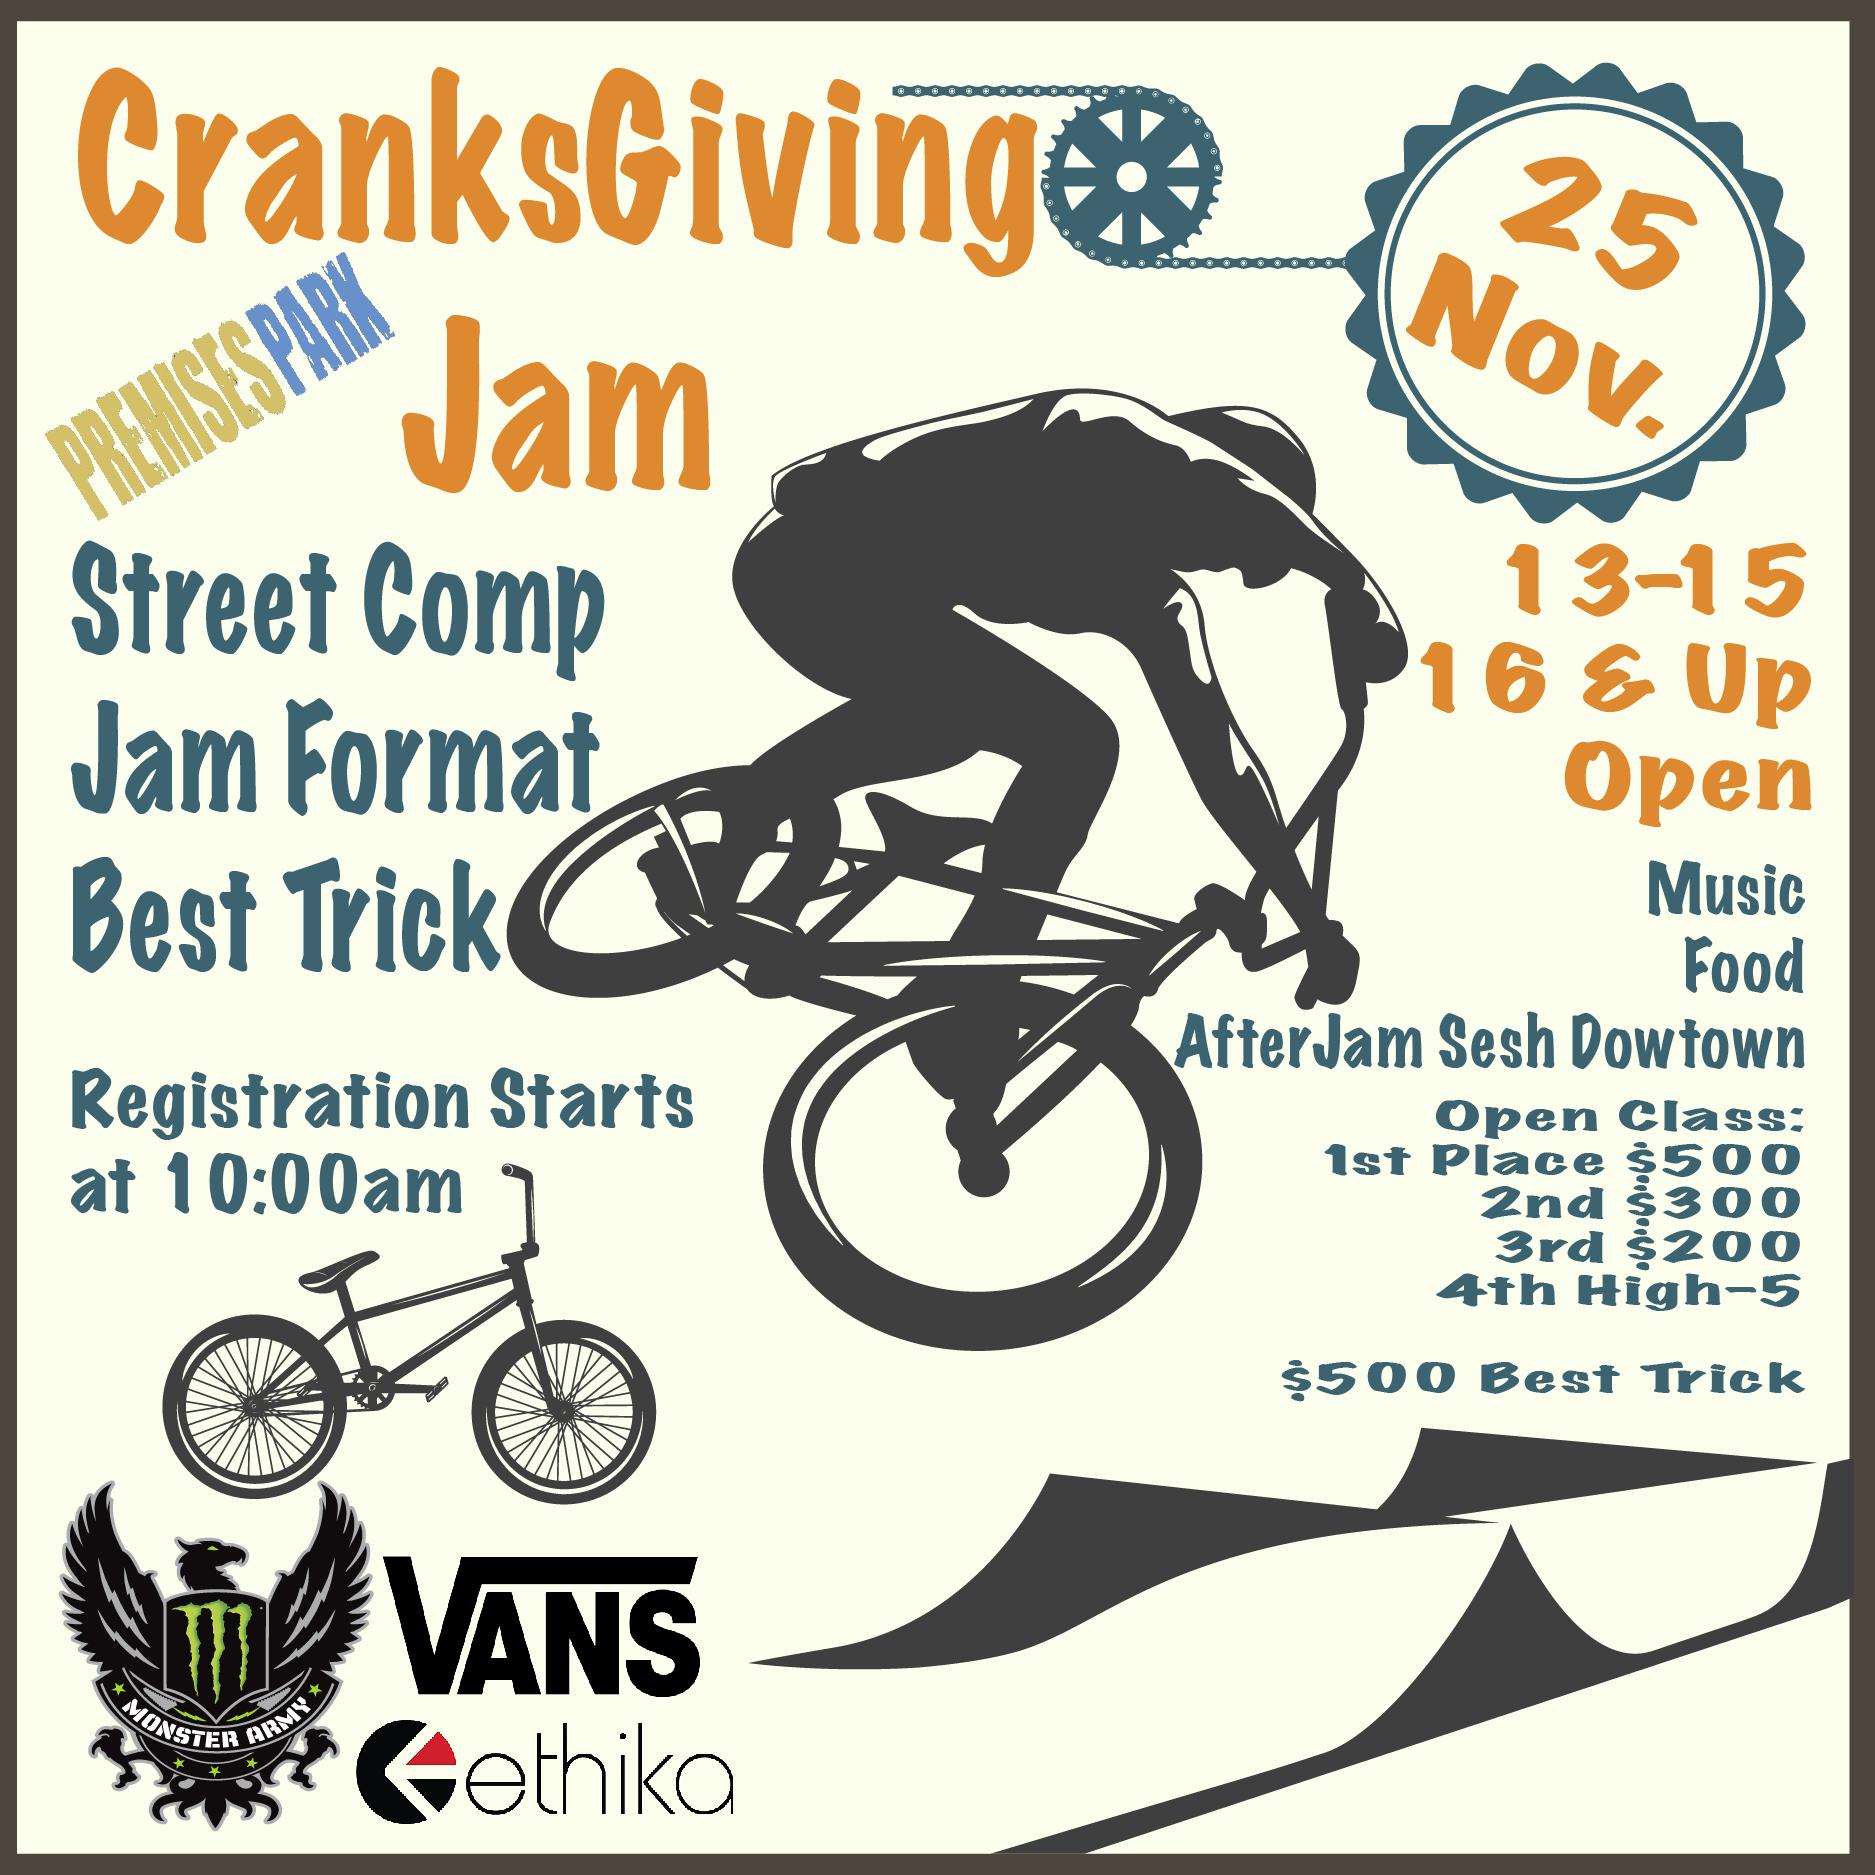 CranksGiving Street Jam Premises Park